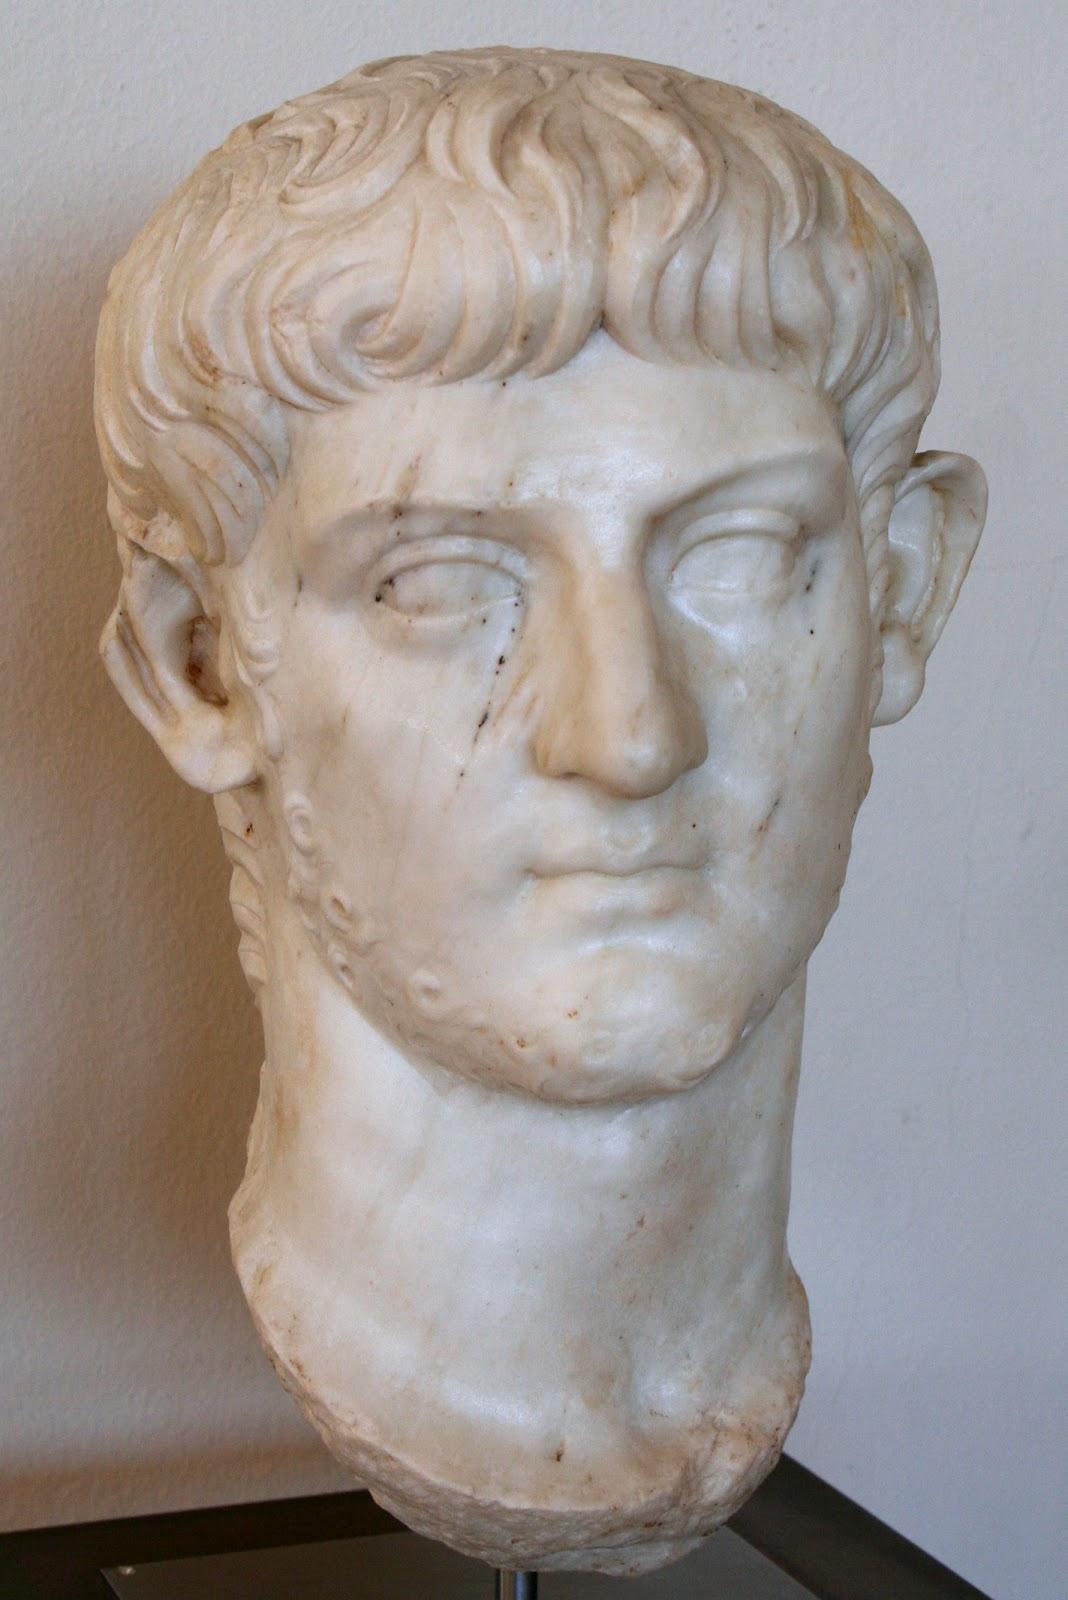 http://1.bp.blogspot.com/-KZQ0rjFYR-U/T24ZnKrkaaI/AAAAAAAAD2g/vPEwcHxJDK8/s1600/Nero+Julius+Caesar+Son+of+Germanicus.JPG